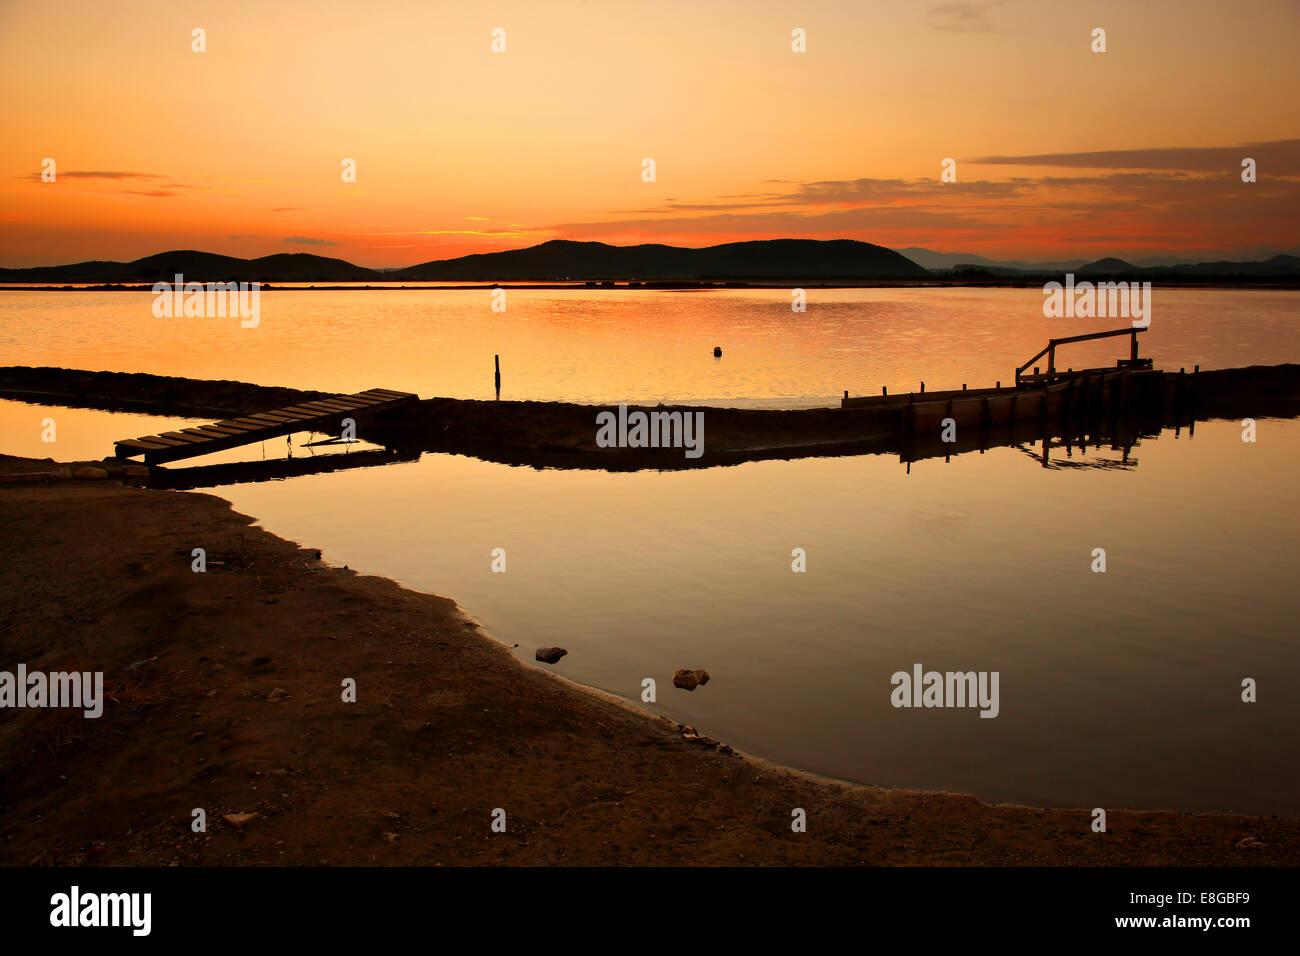 Sunset at the Canal of Foinikia (popular for mudbaths), lagoon of Messolonghi-Aitoliko, Aitoloakarnania, Greece. - Stock Image